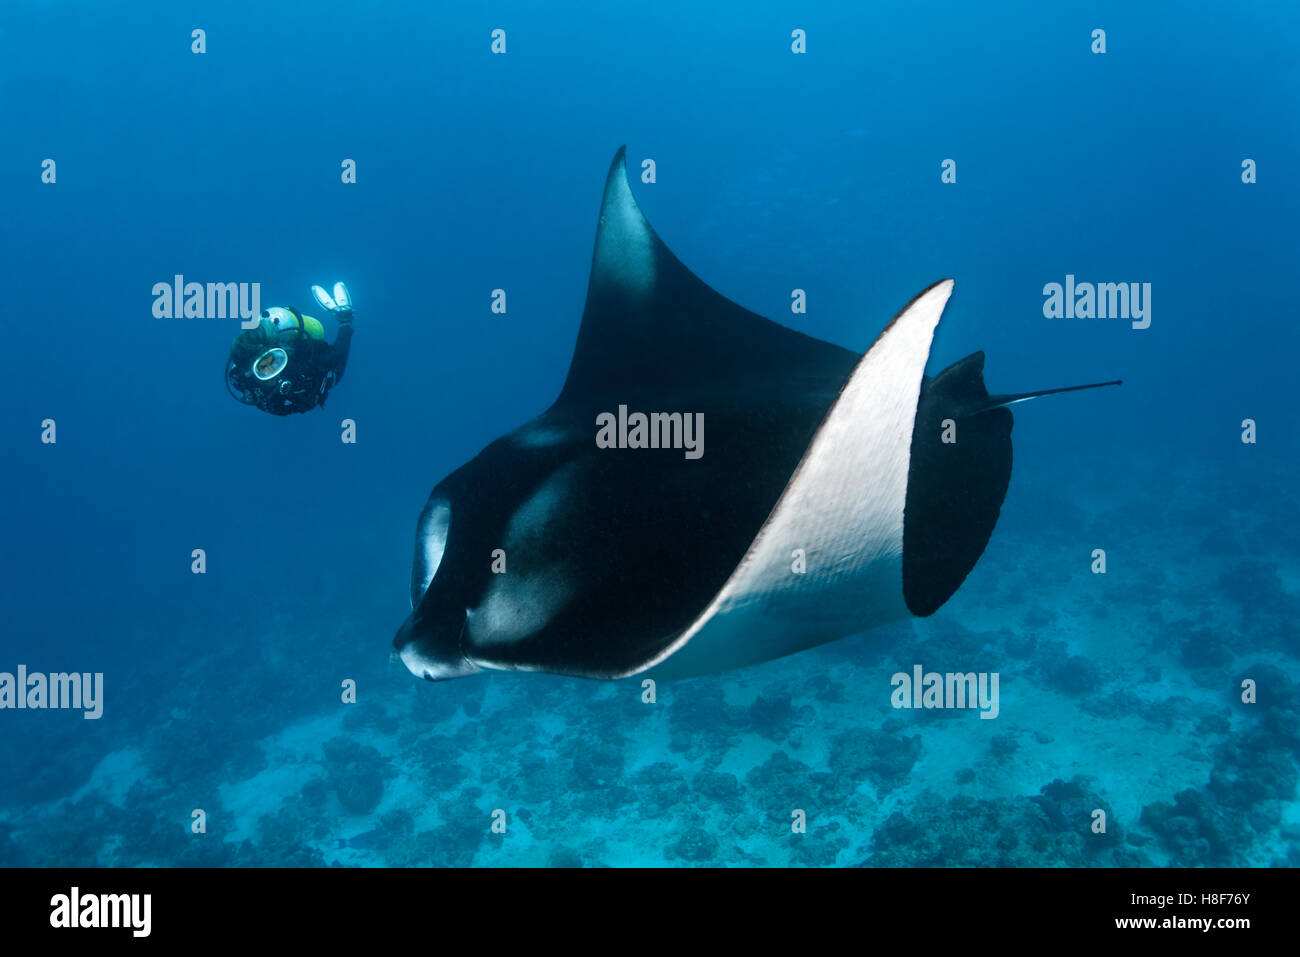 Diver observing reef manta ray (Manta alfredi), Indian Ocean, Maldives - Stock Image